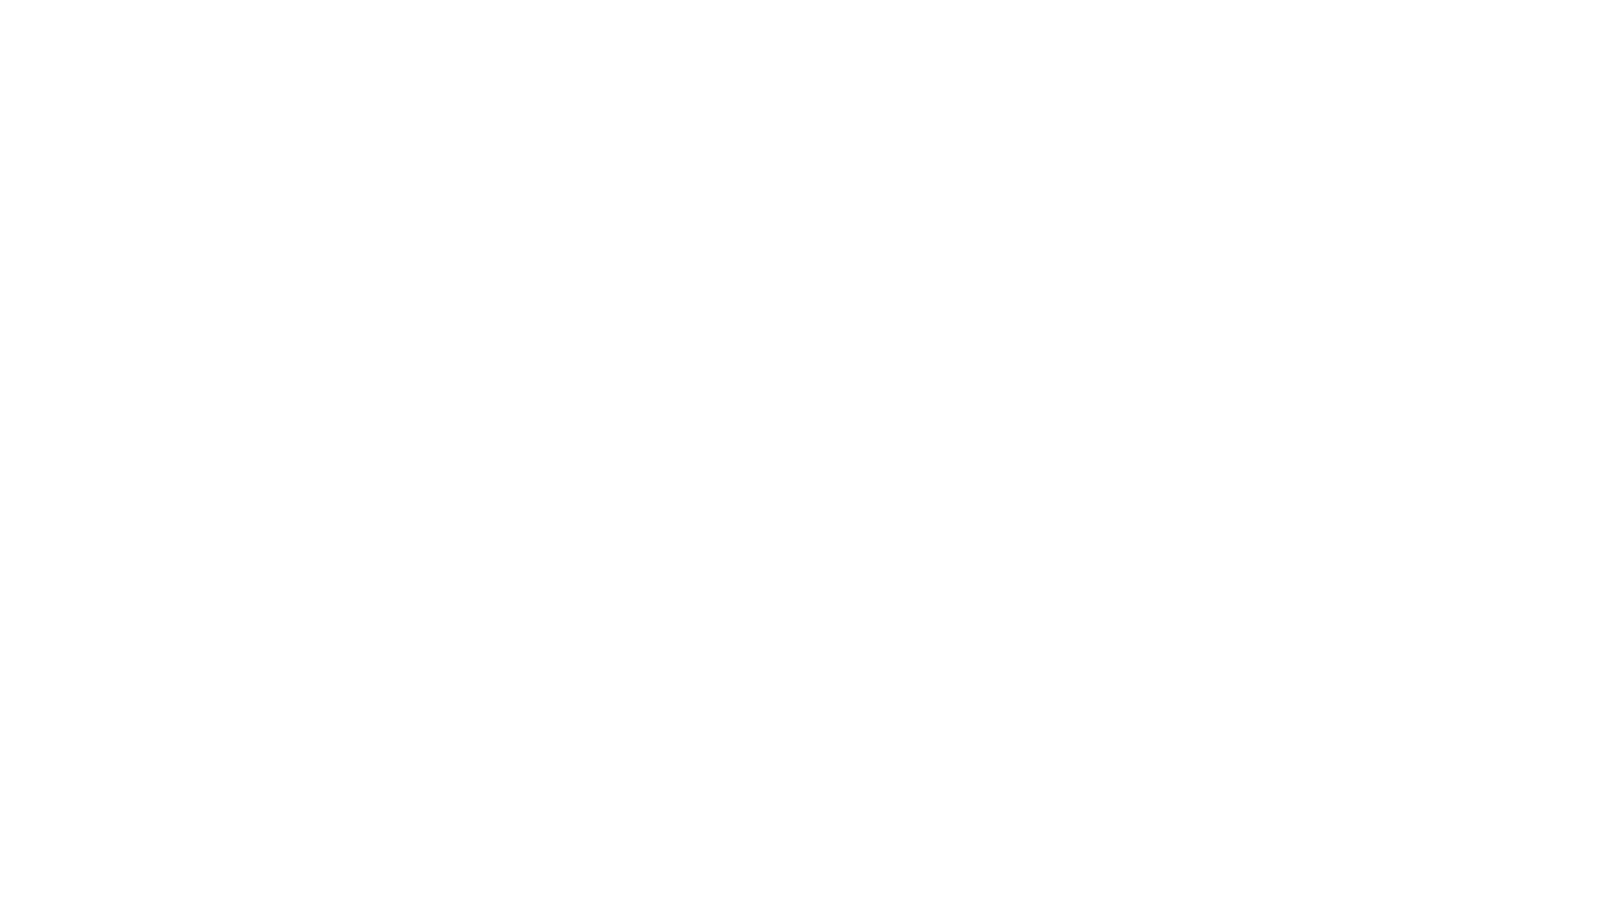 Гипсовая лепнина Аврора (Краснодар) каталог лепного декора https://aurora-interior.ru/?page_id=19565